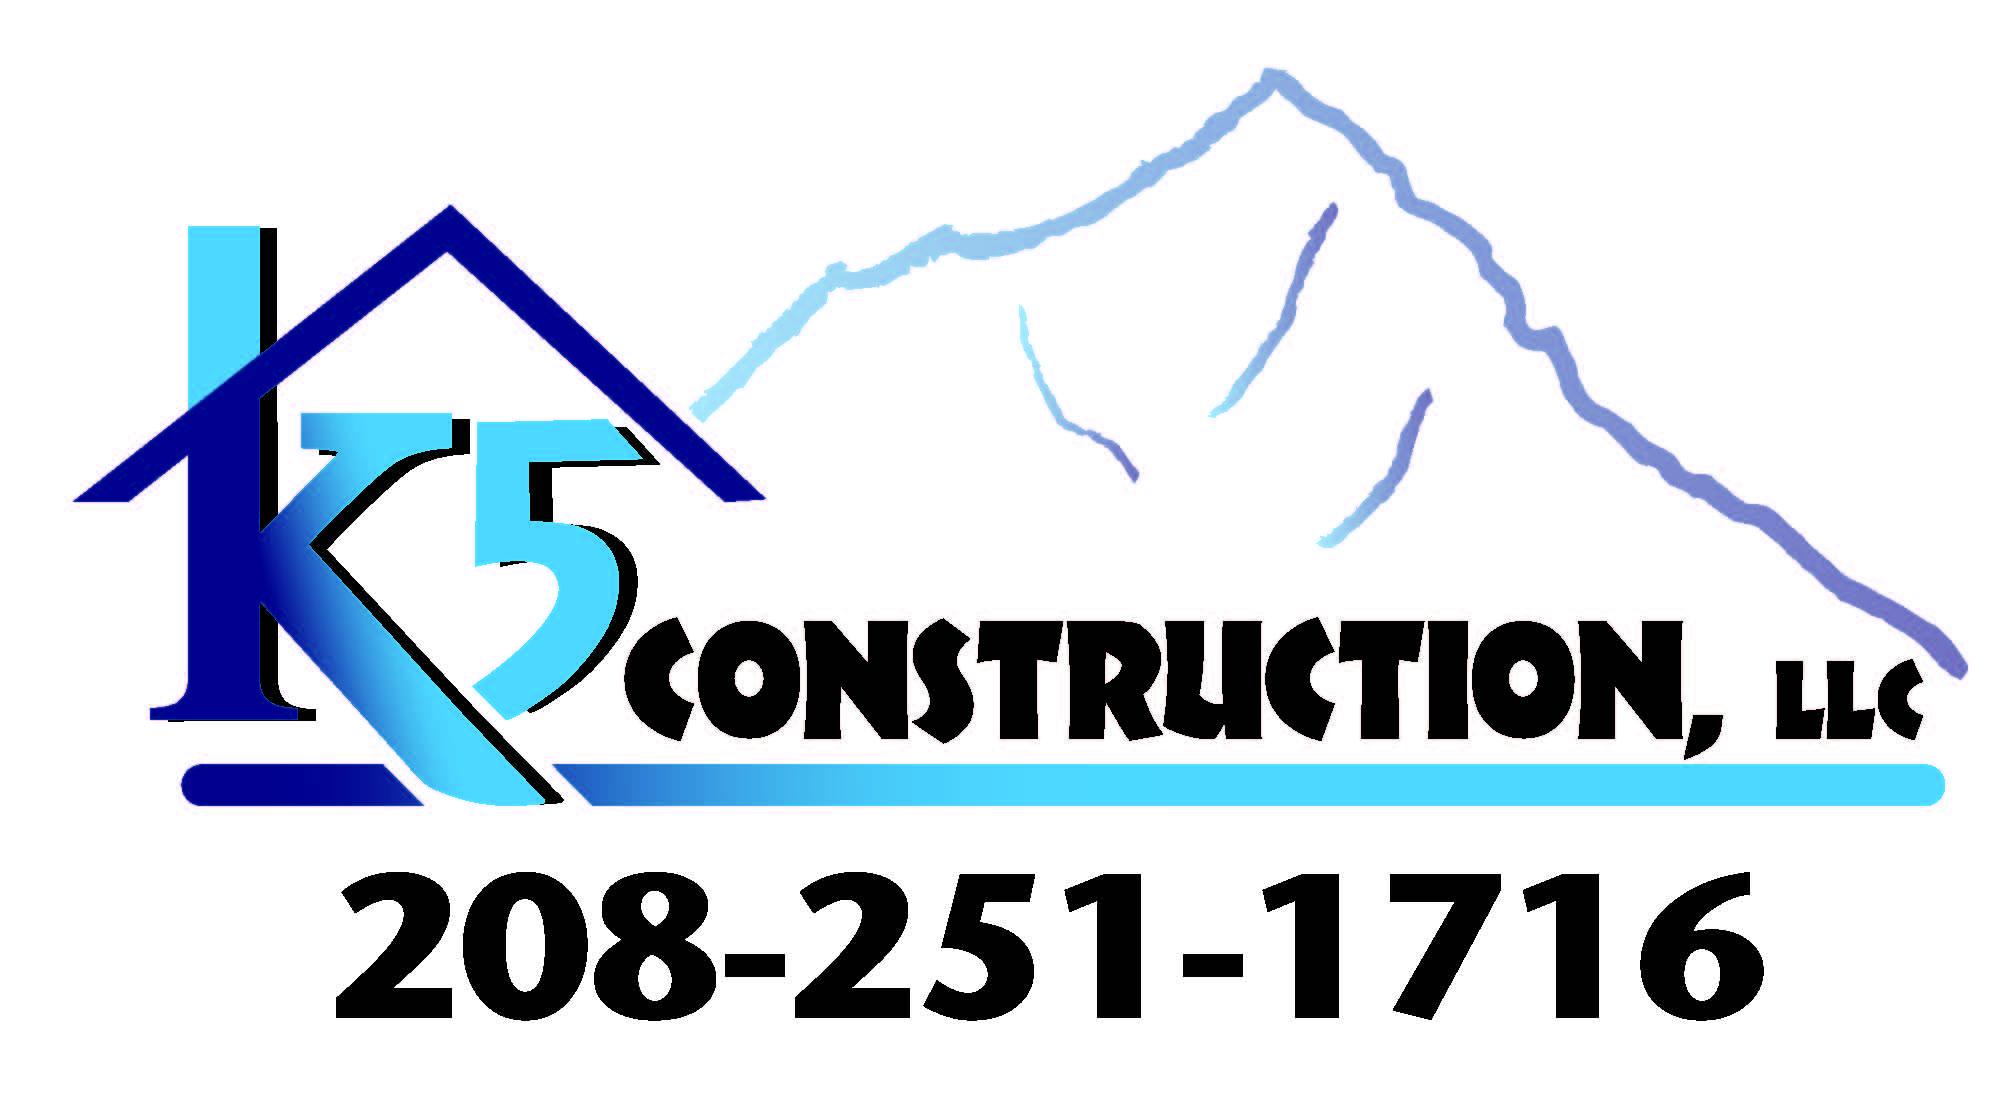 K5 Construction